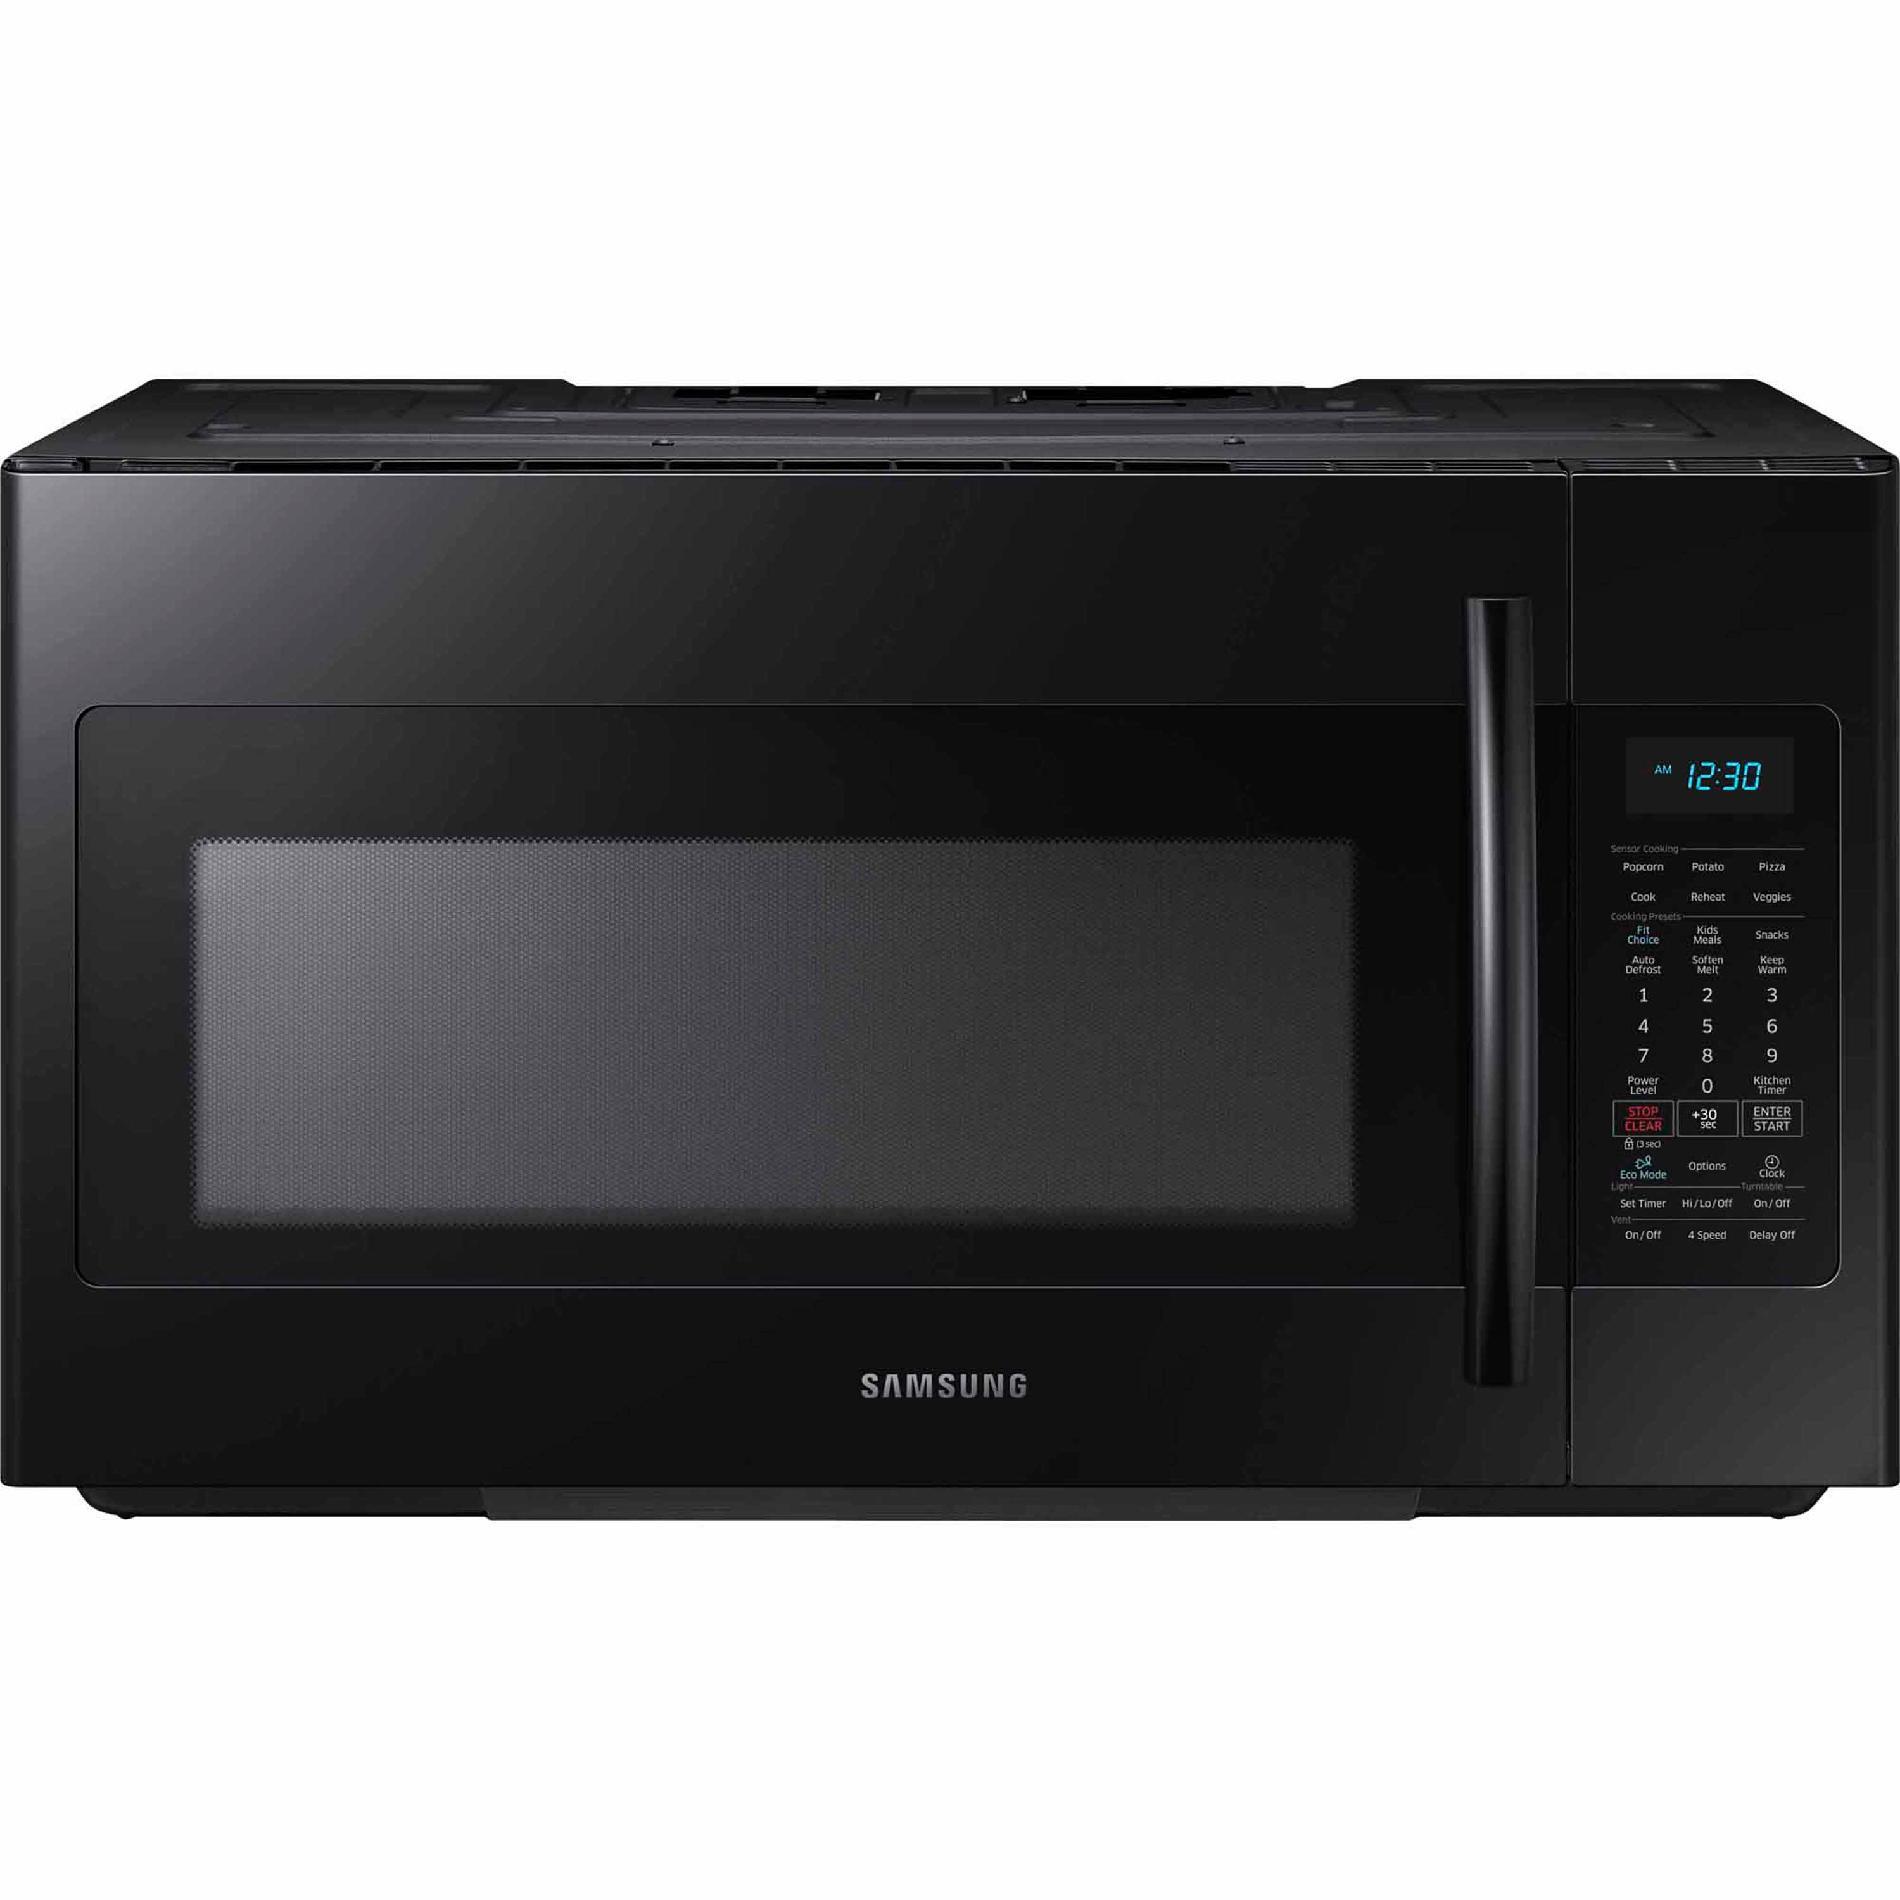 Samsung 1.8 cu.ft. Over-the-Range Microwave w/ Sensor Cooking - Black